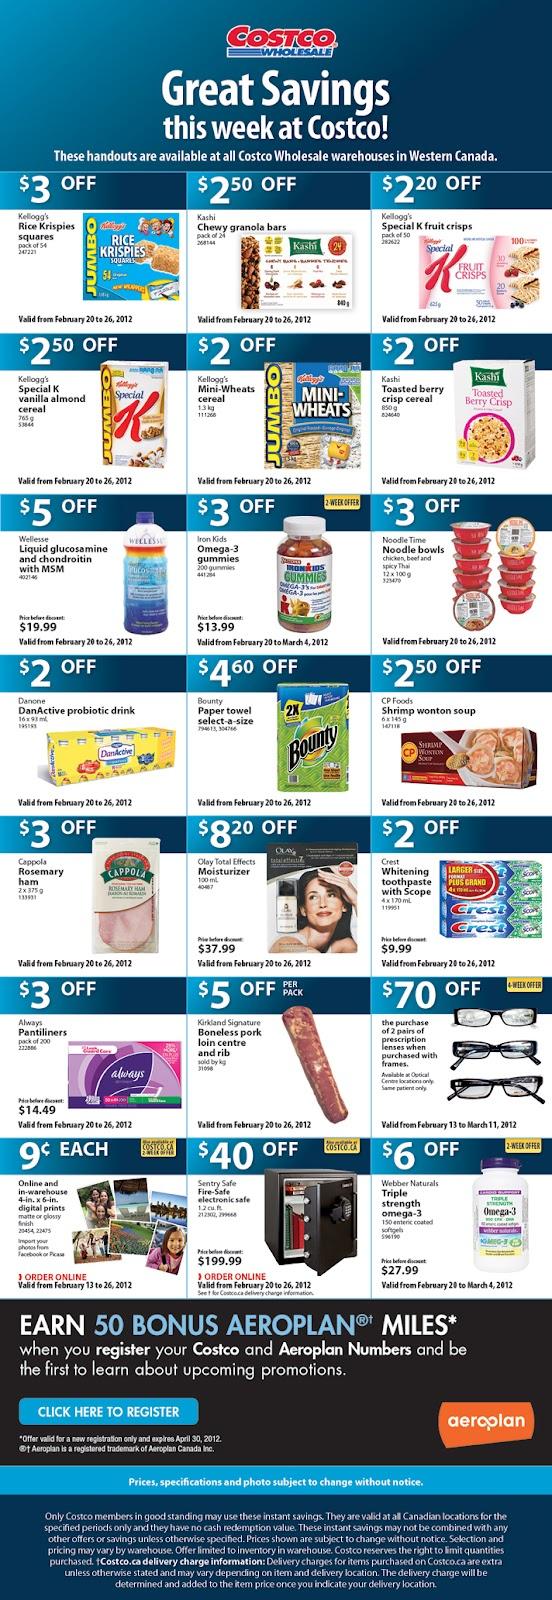 Visit calgary coupons